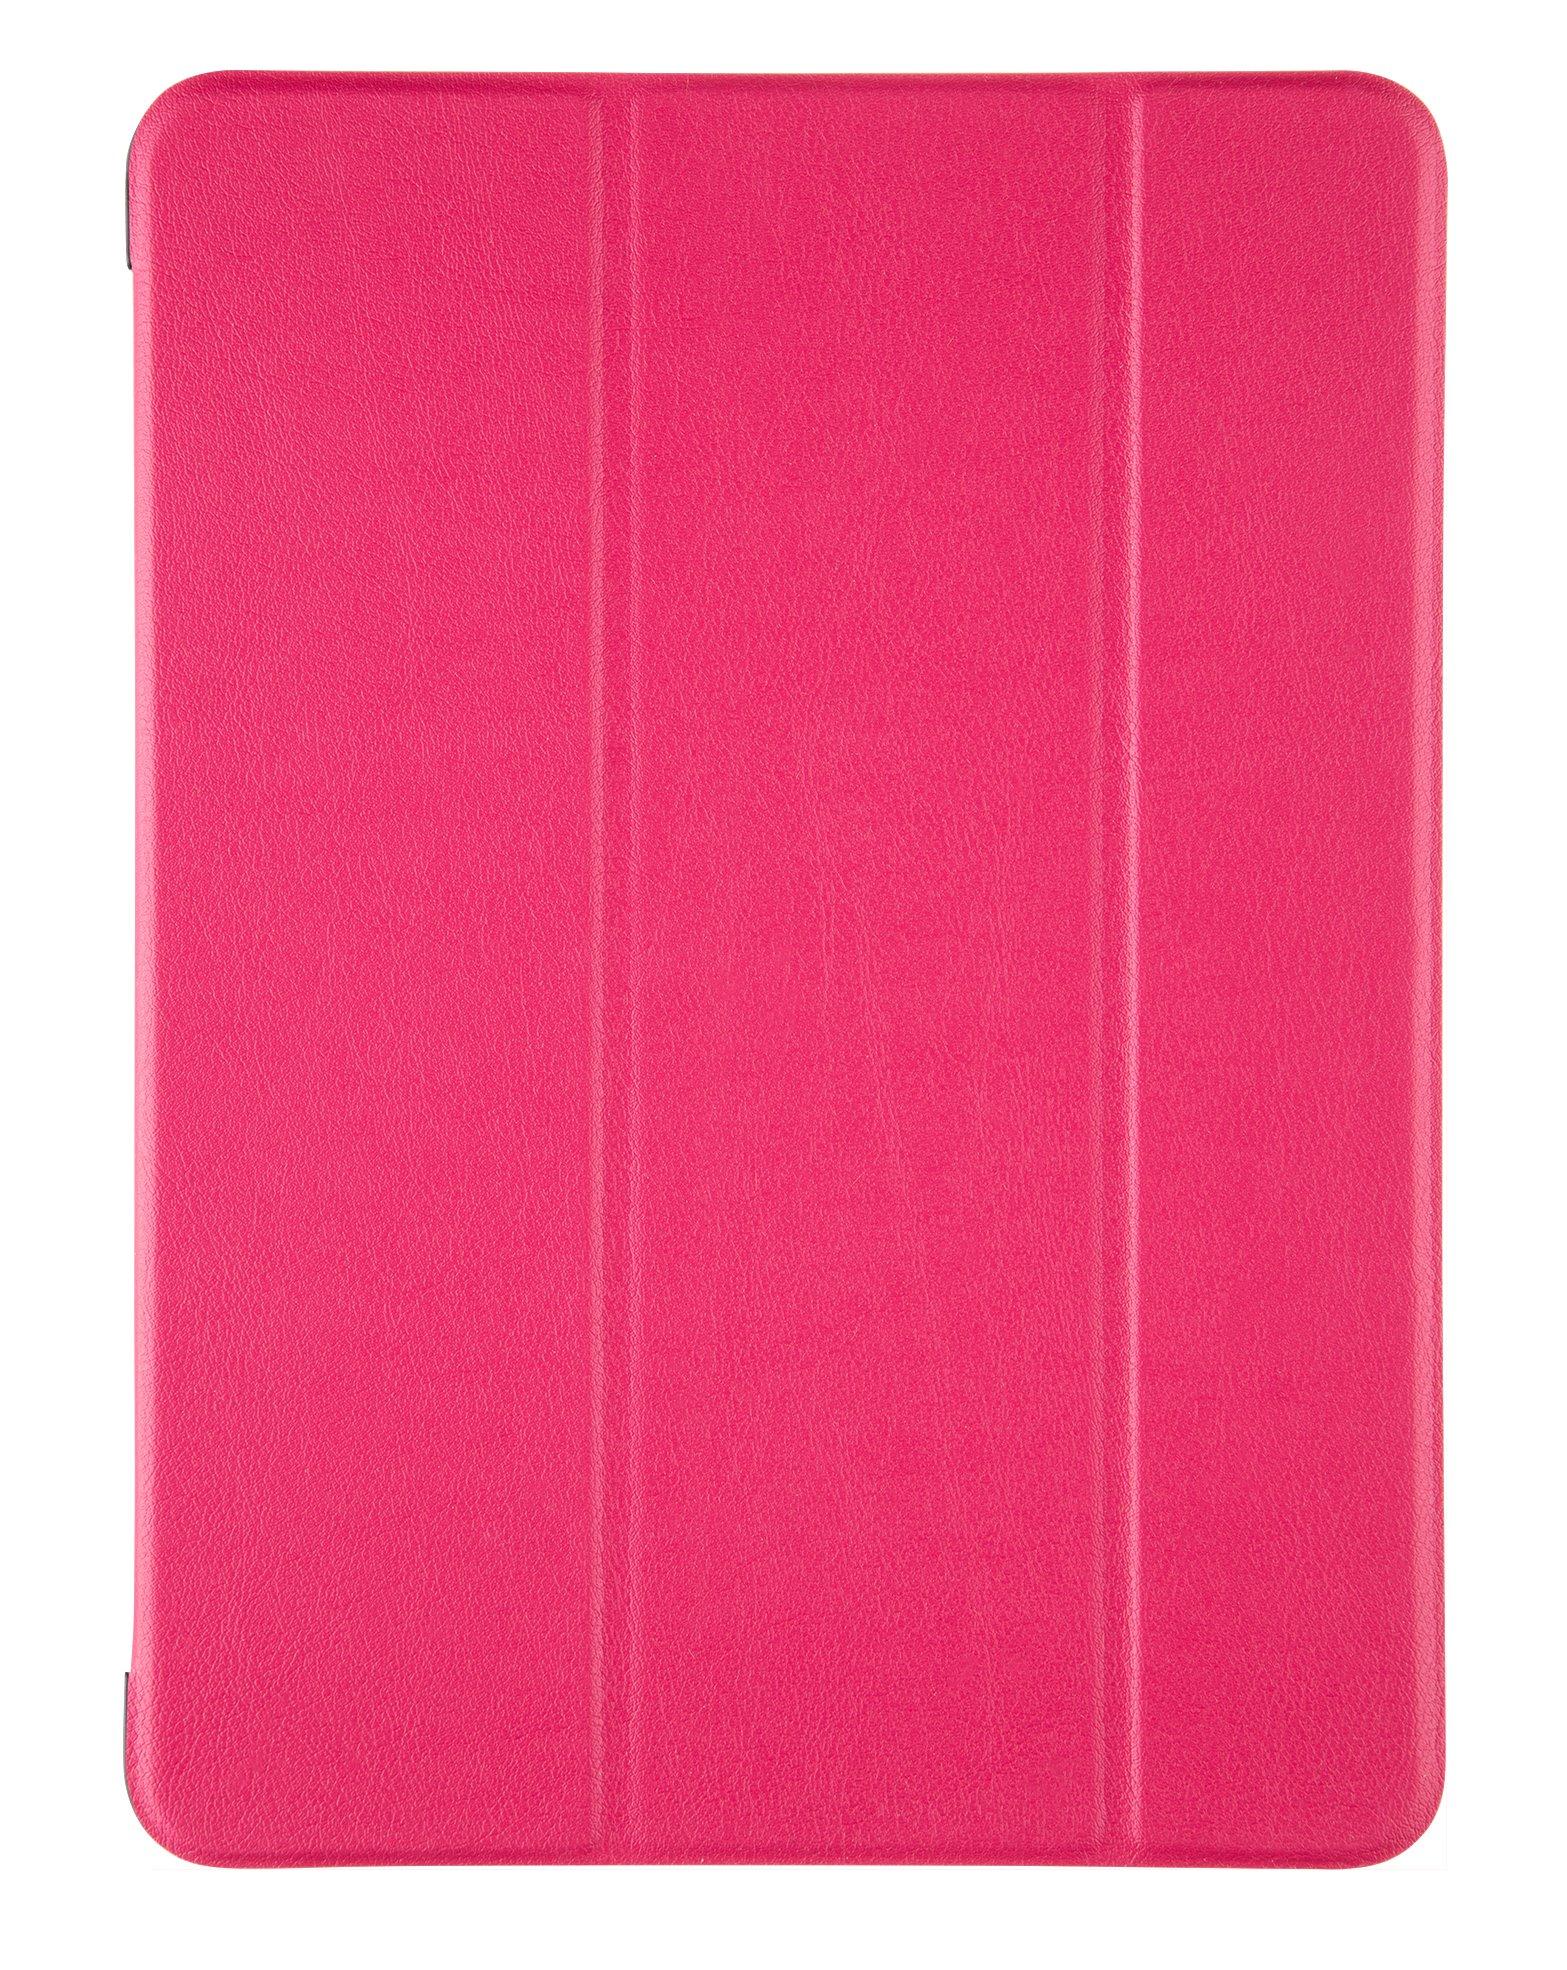 Tactical Book Tri Fold Pouzdro pro Samsung T730/T736/T970/T975 Galaxy Tab S7 FE 5G / S7+ 12.4 Pink 8596311154294